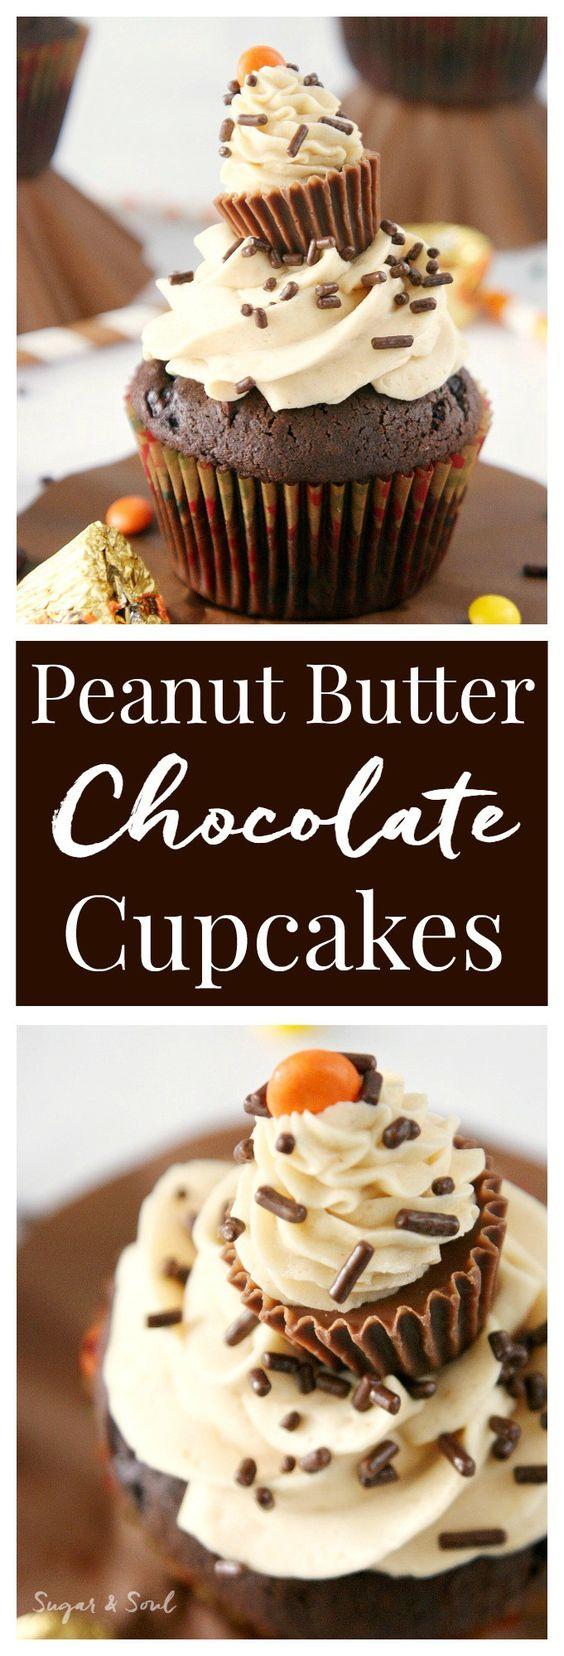 cupcakes peanut butter peanuts chocolate cupcakes chocolate peanut ...